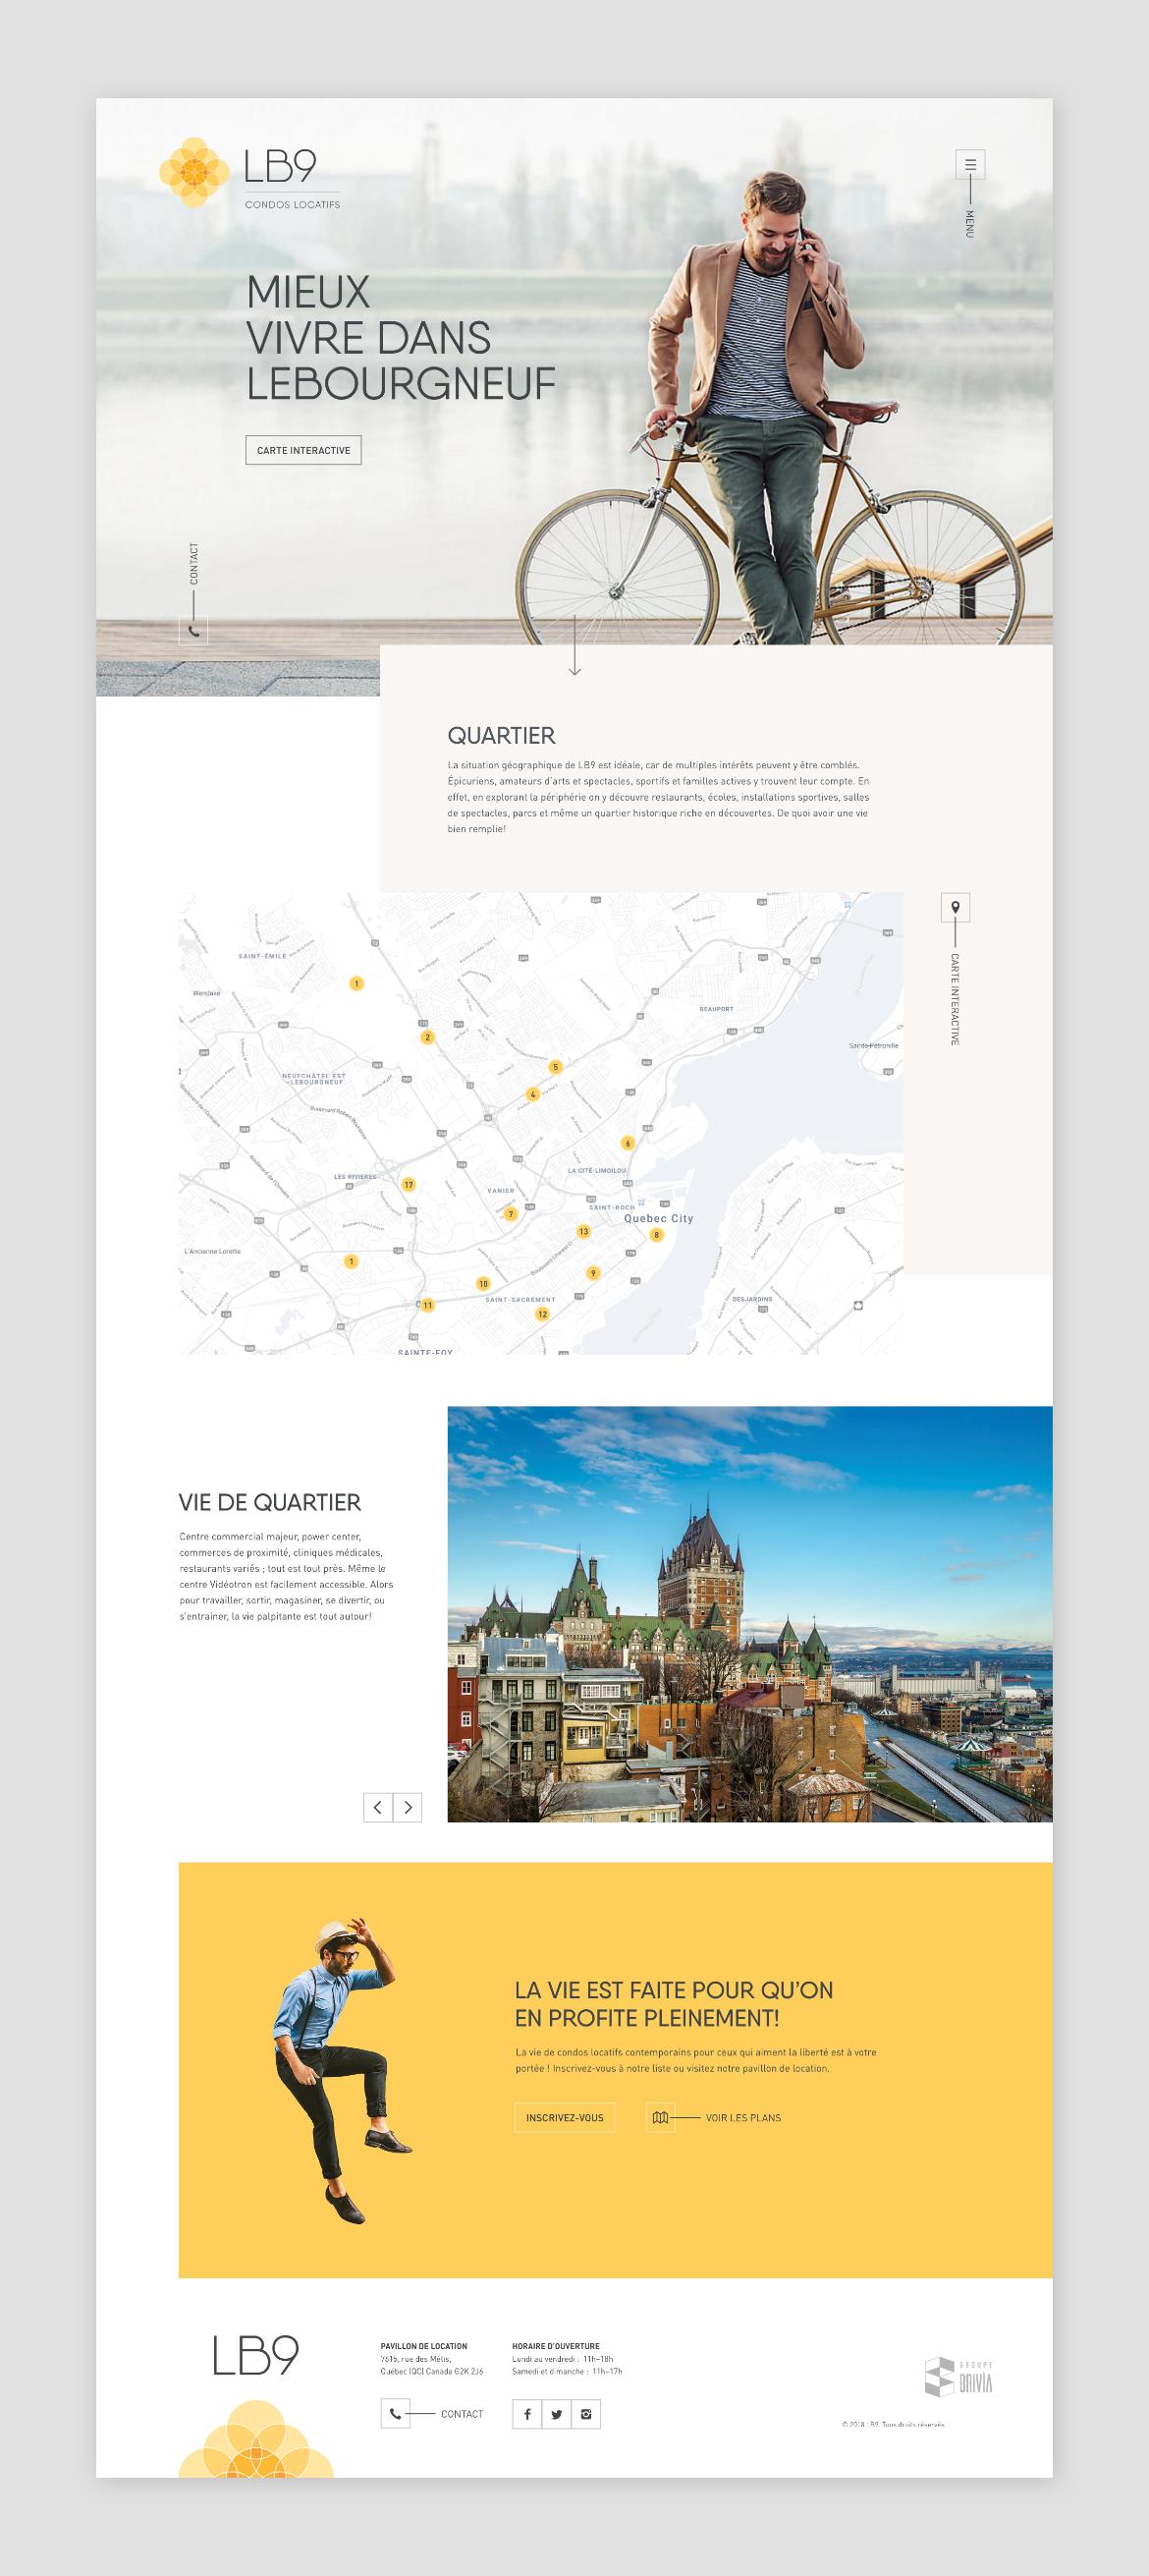 condos quebec city Web Design  lebourgneuf ui design Website property housing lifestyle real estate